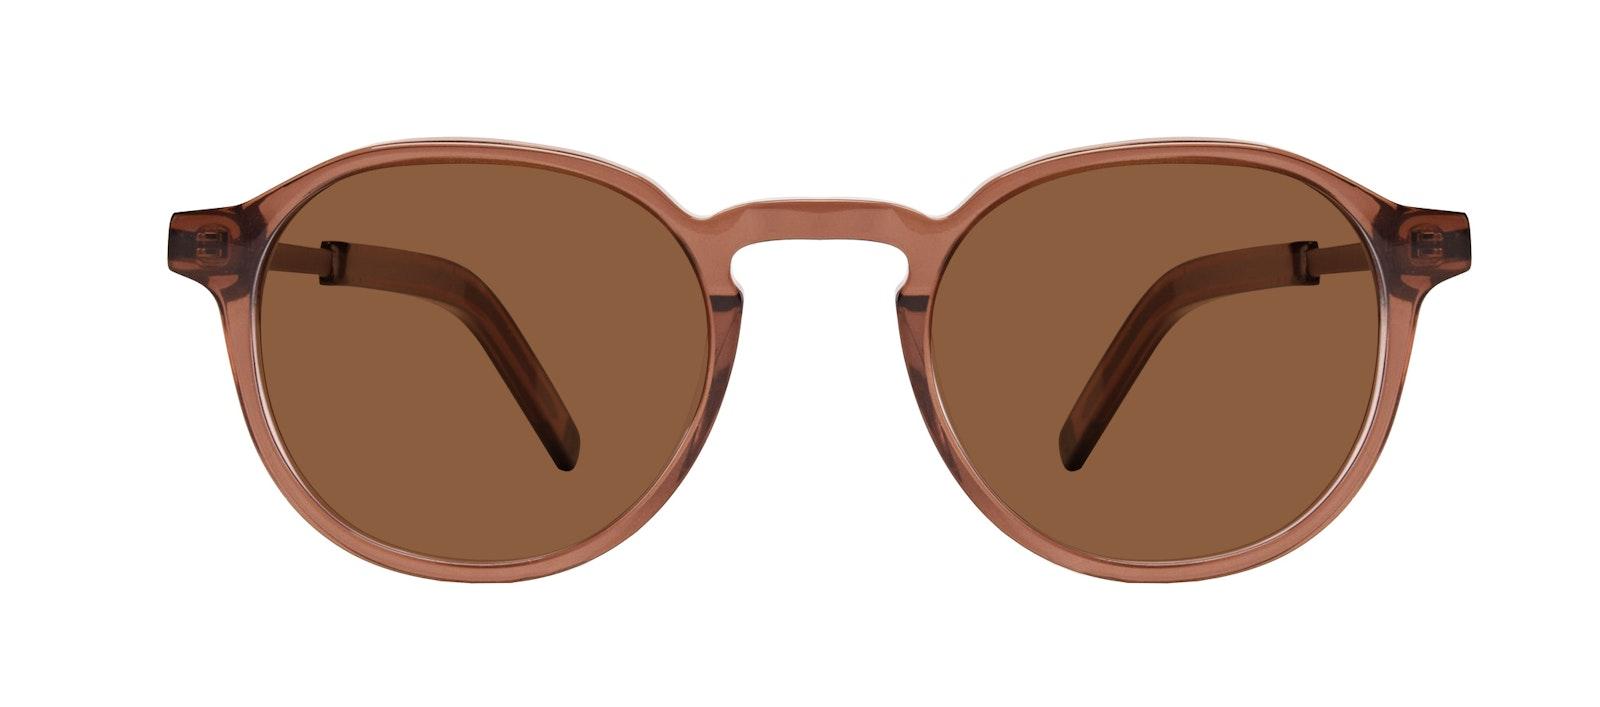 Affordable Fashion Glasses Round Sunglasses Men Prime XL Terra Front